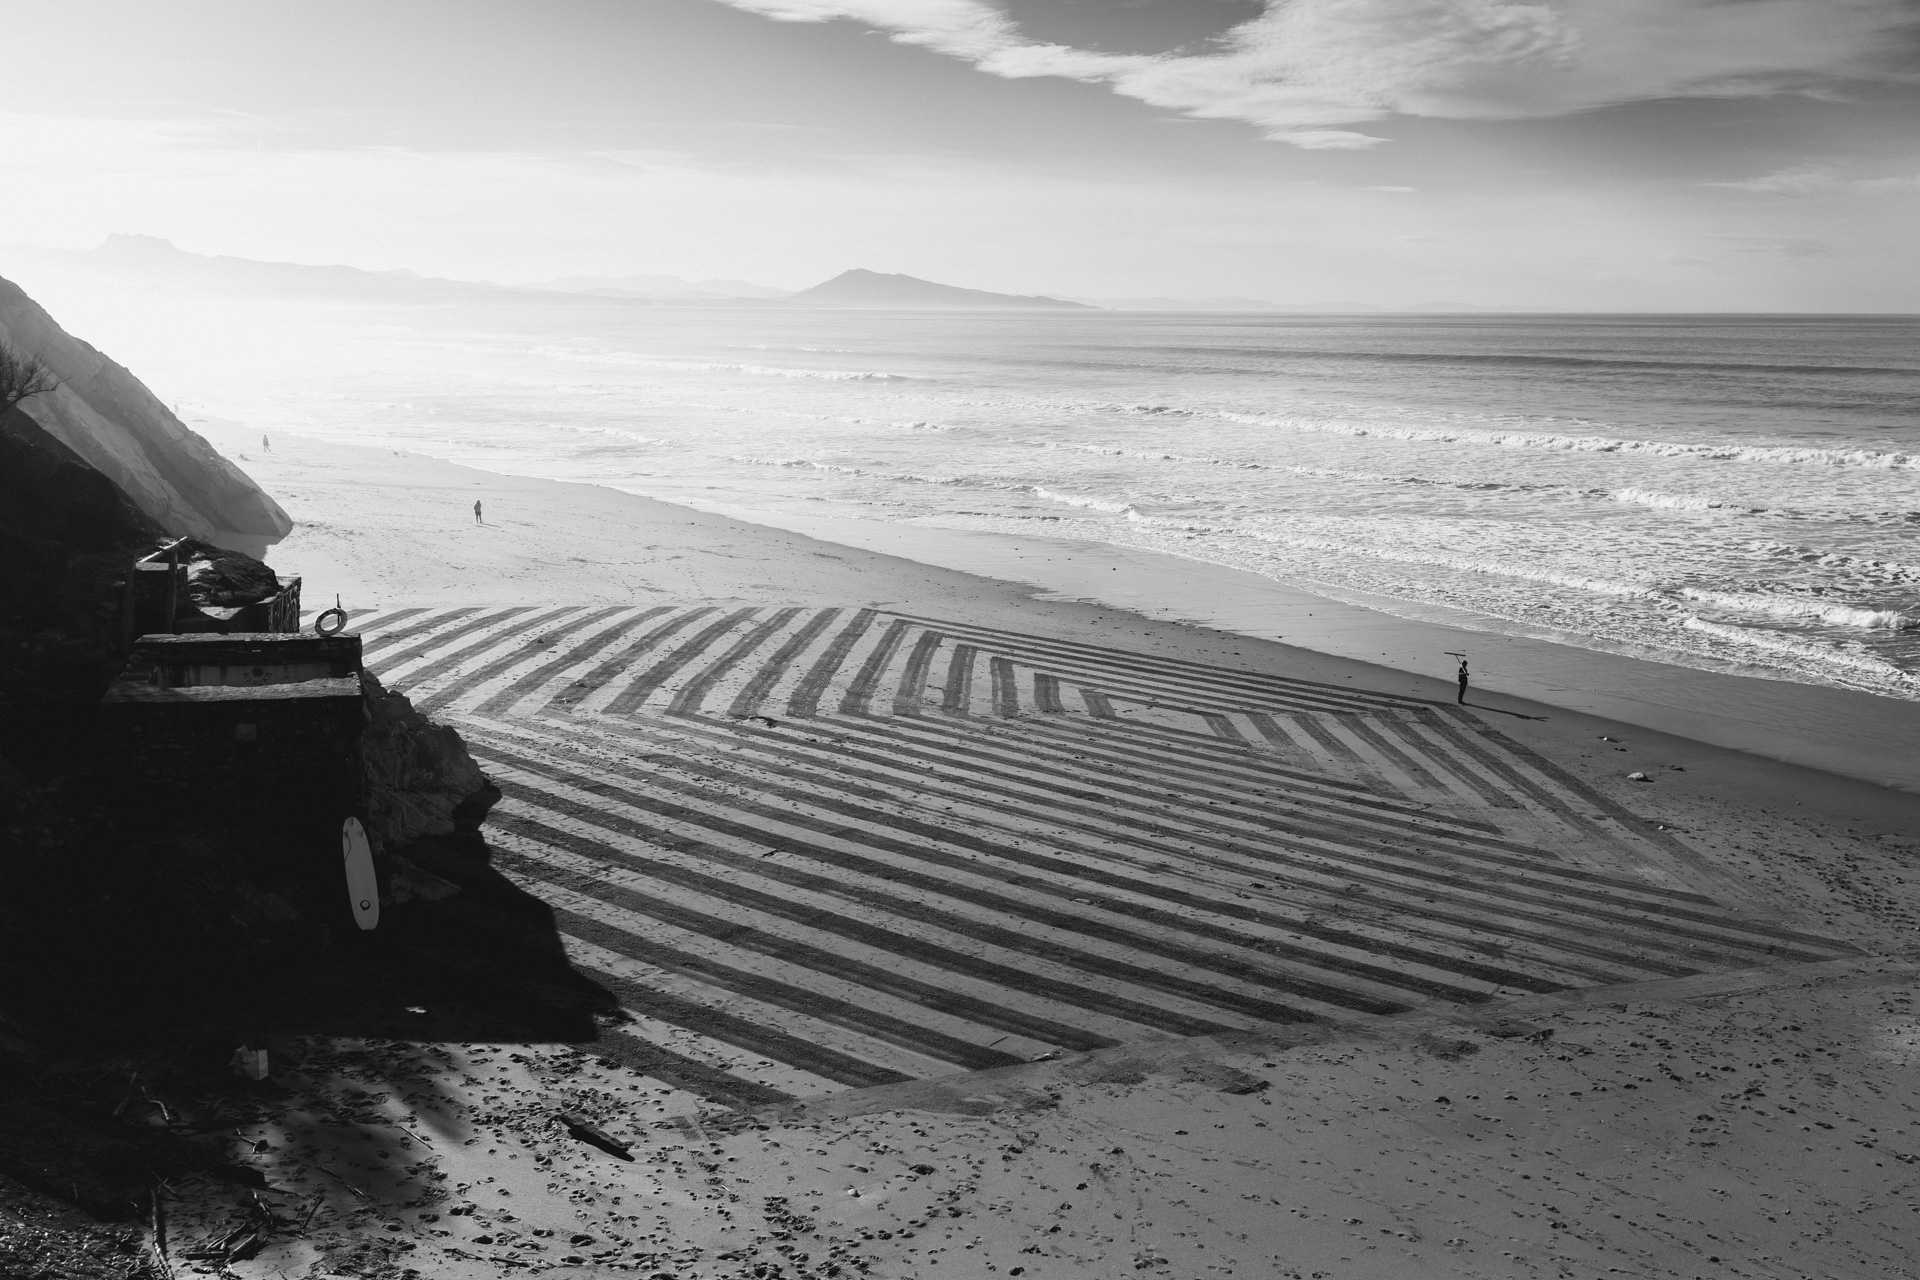 Damien-dohmen-sand-print-lx-one-29